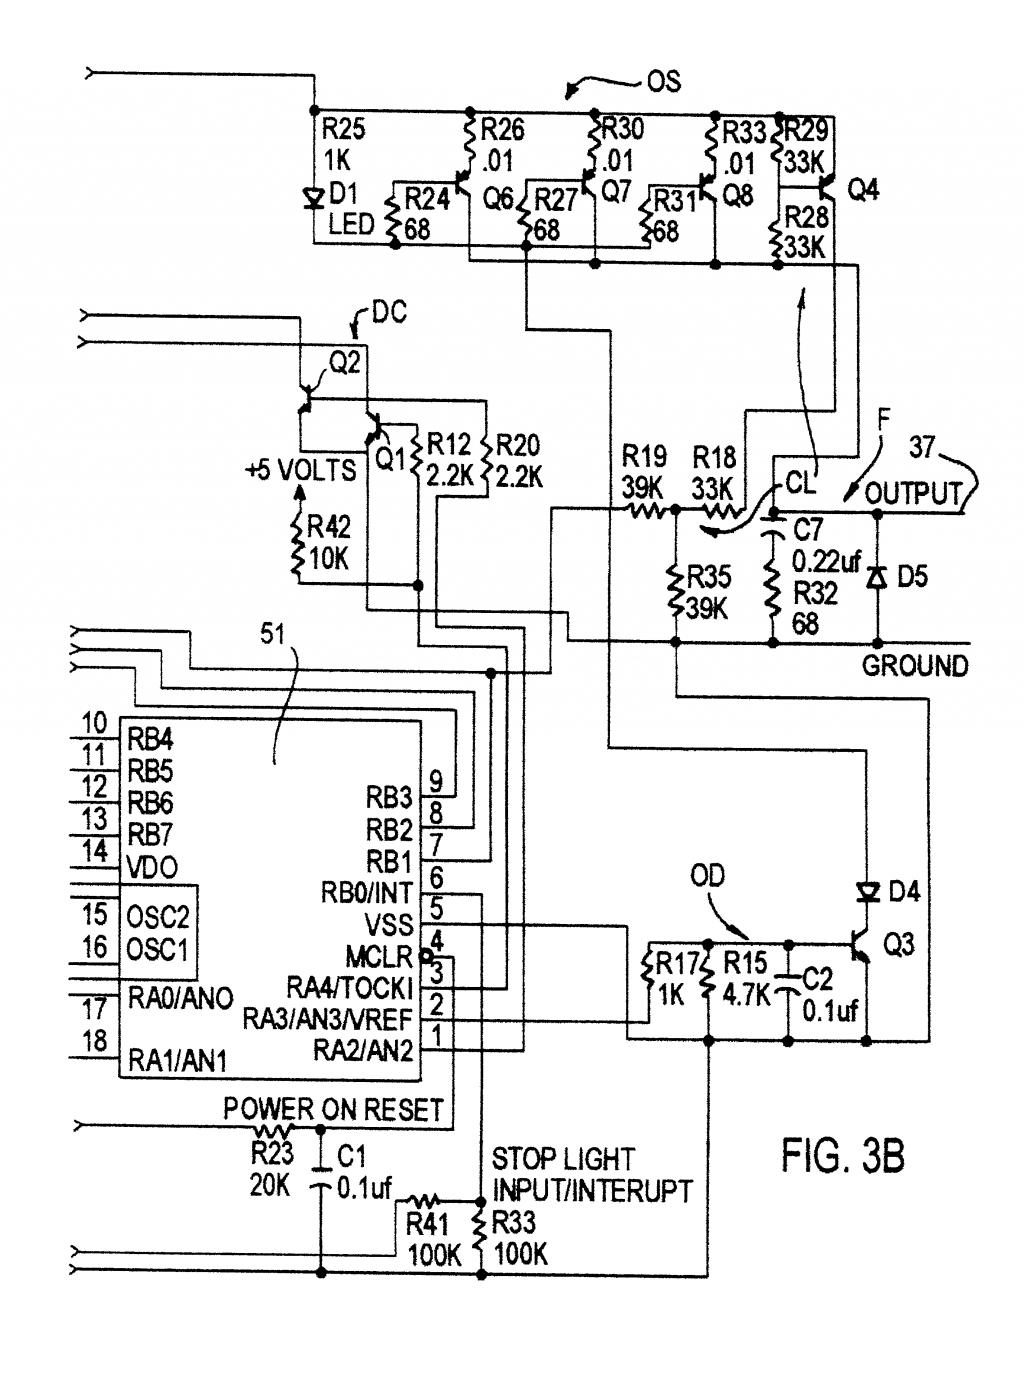 Schwinn S350 Electric Scooter Wiring Diagram Wiring Diagram